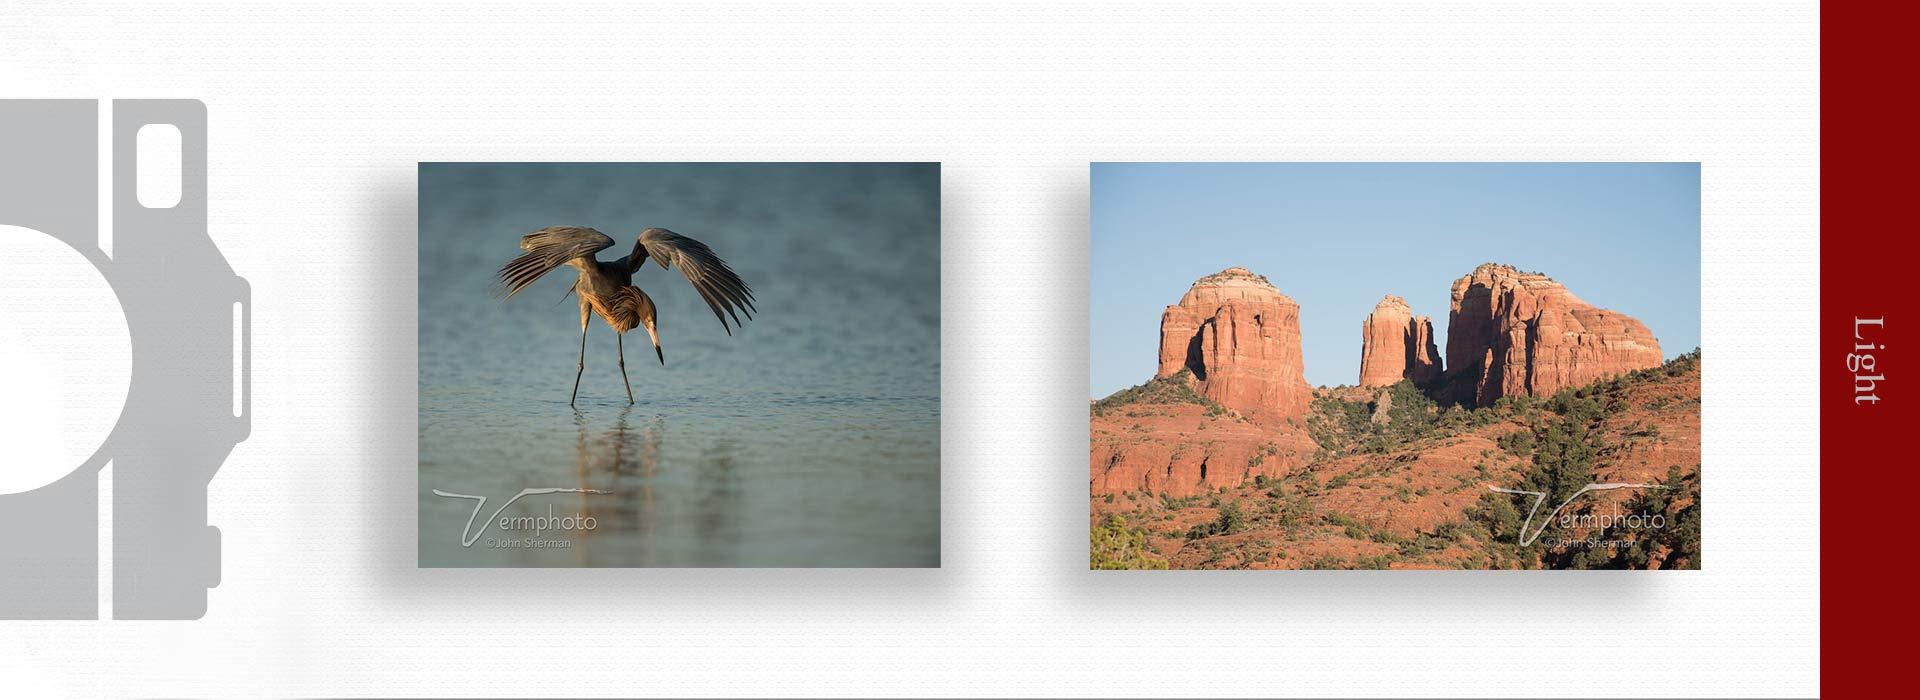 Light in photography 3 - مهمترین ویژگی های عکس خوب چیست ؟